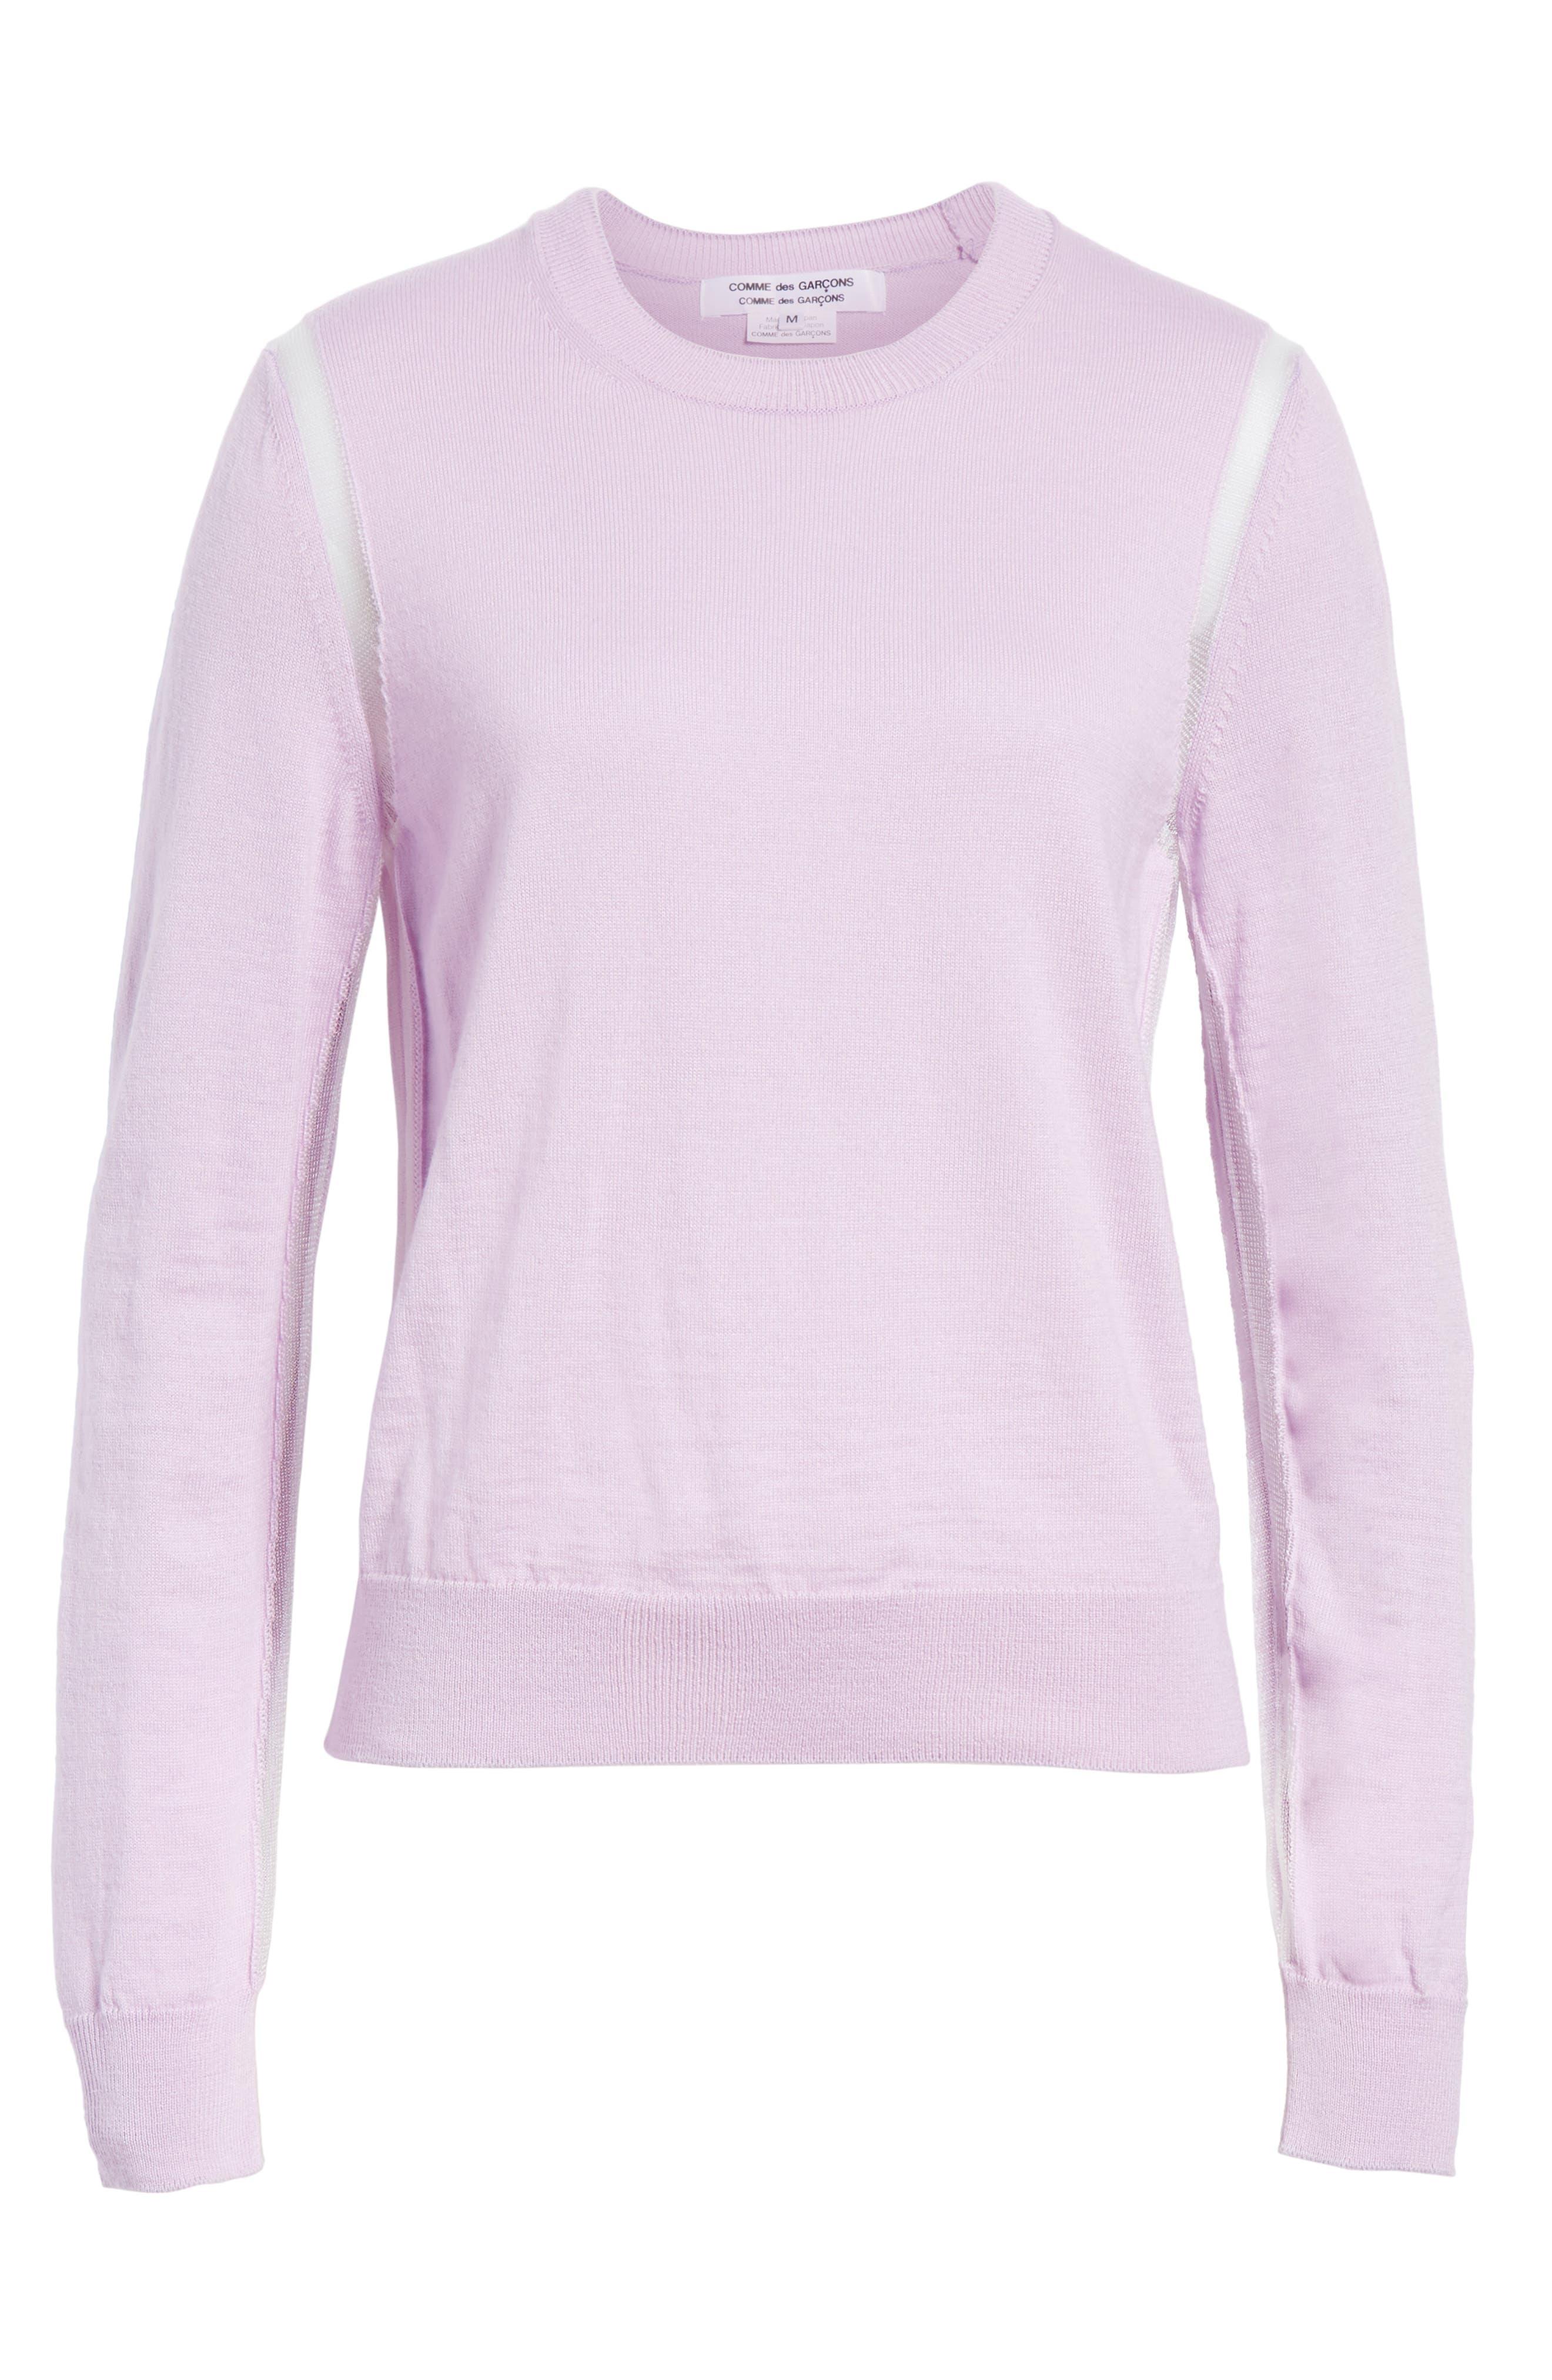 Sheer Panel Crewneck Sweater,                             Alternate thumbnail 6, color,                             500